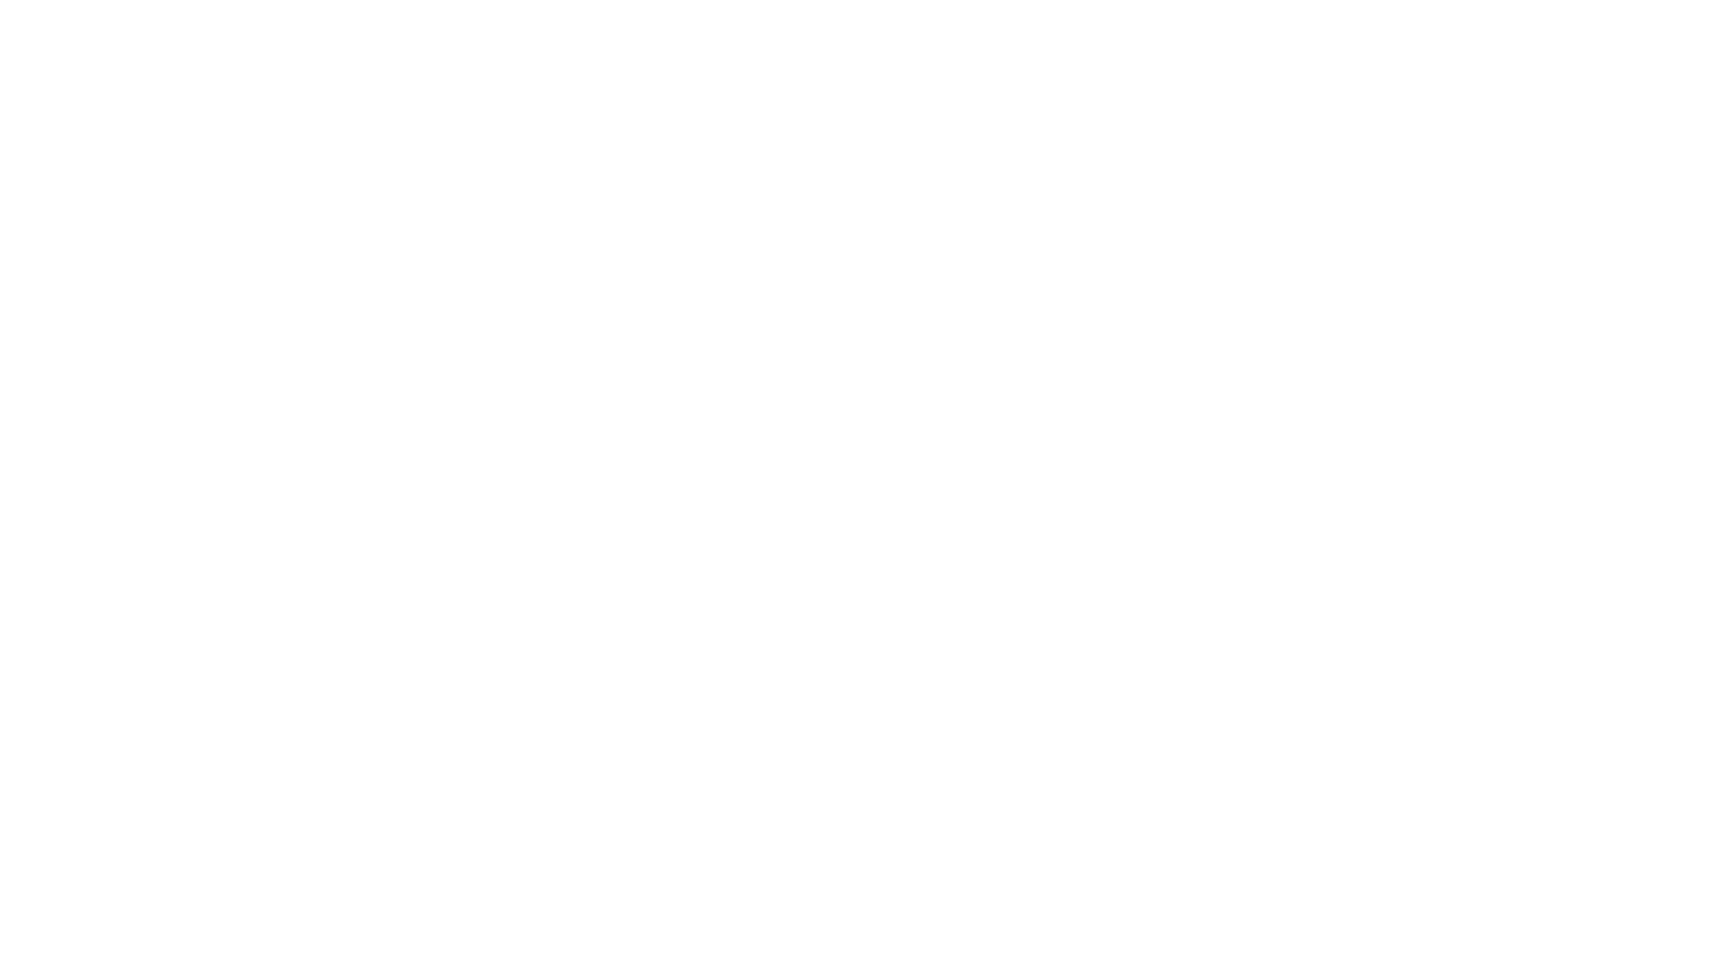 Julared